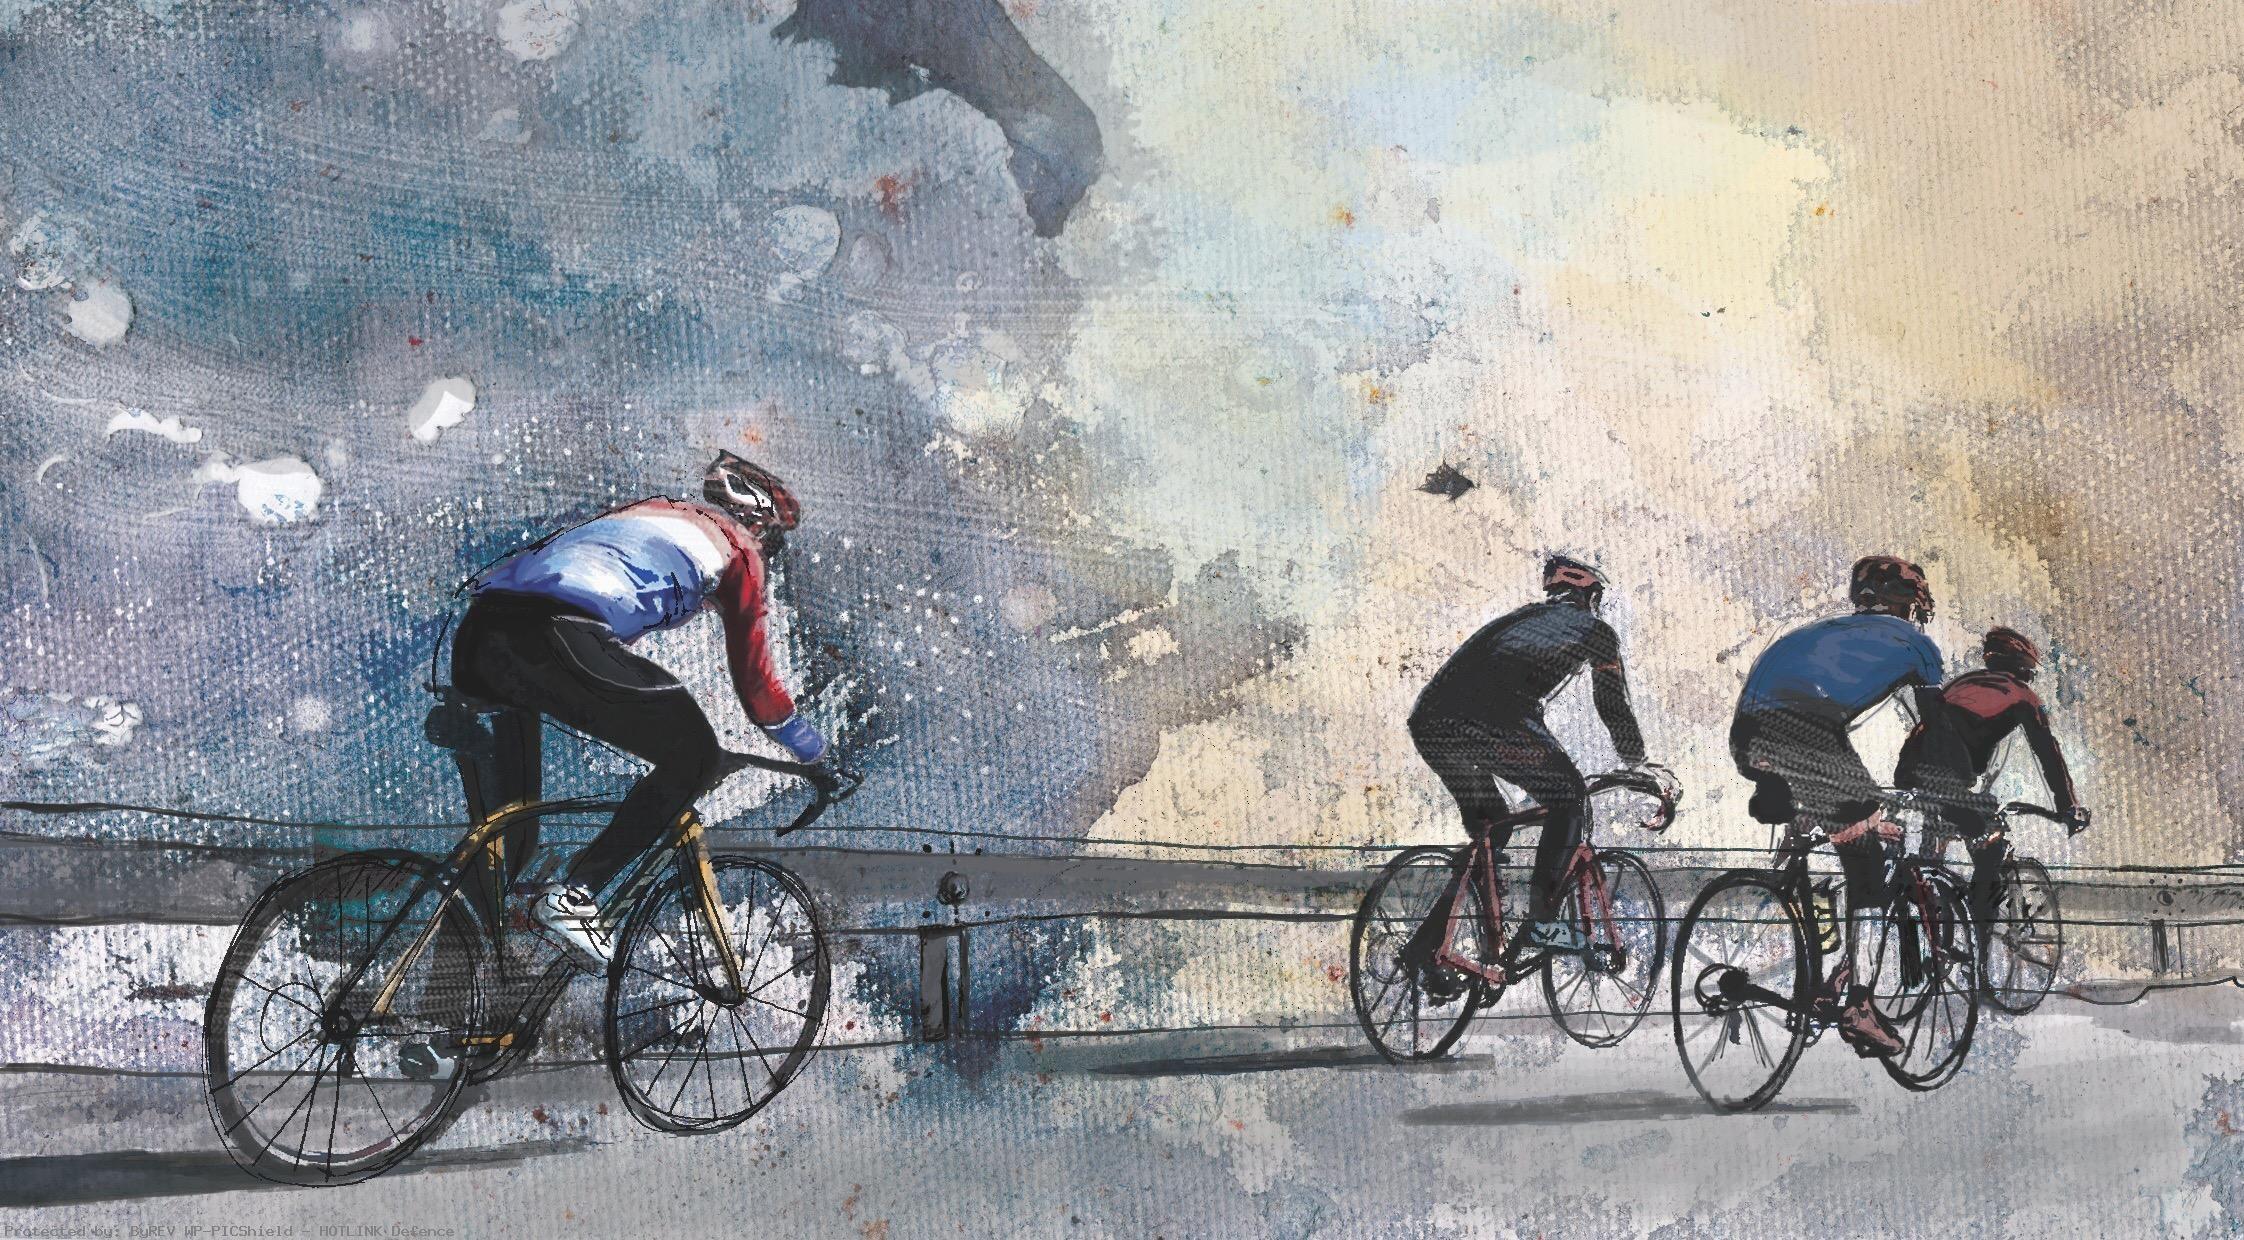 Cycling-art-road-bike-watercolor-wallpaper-wp4003493